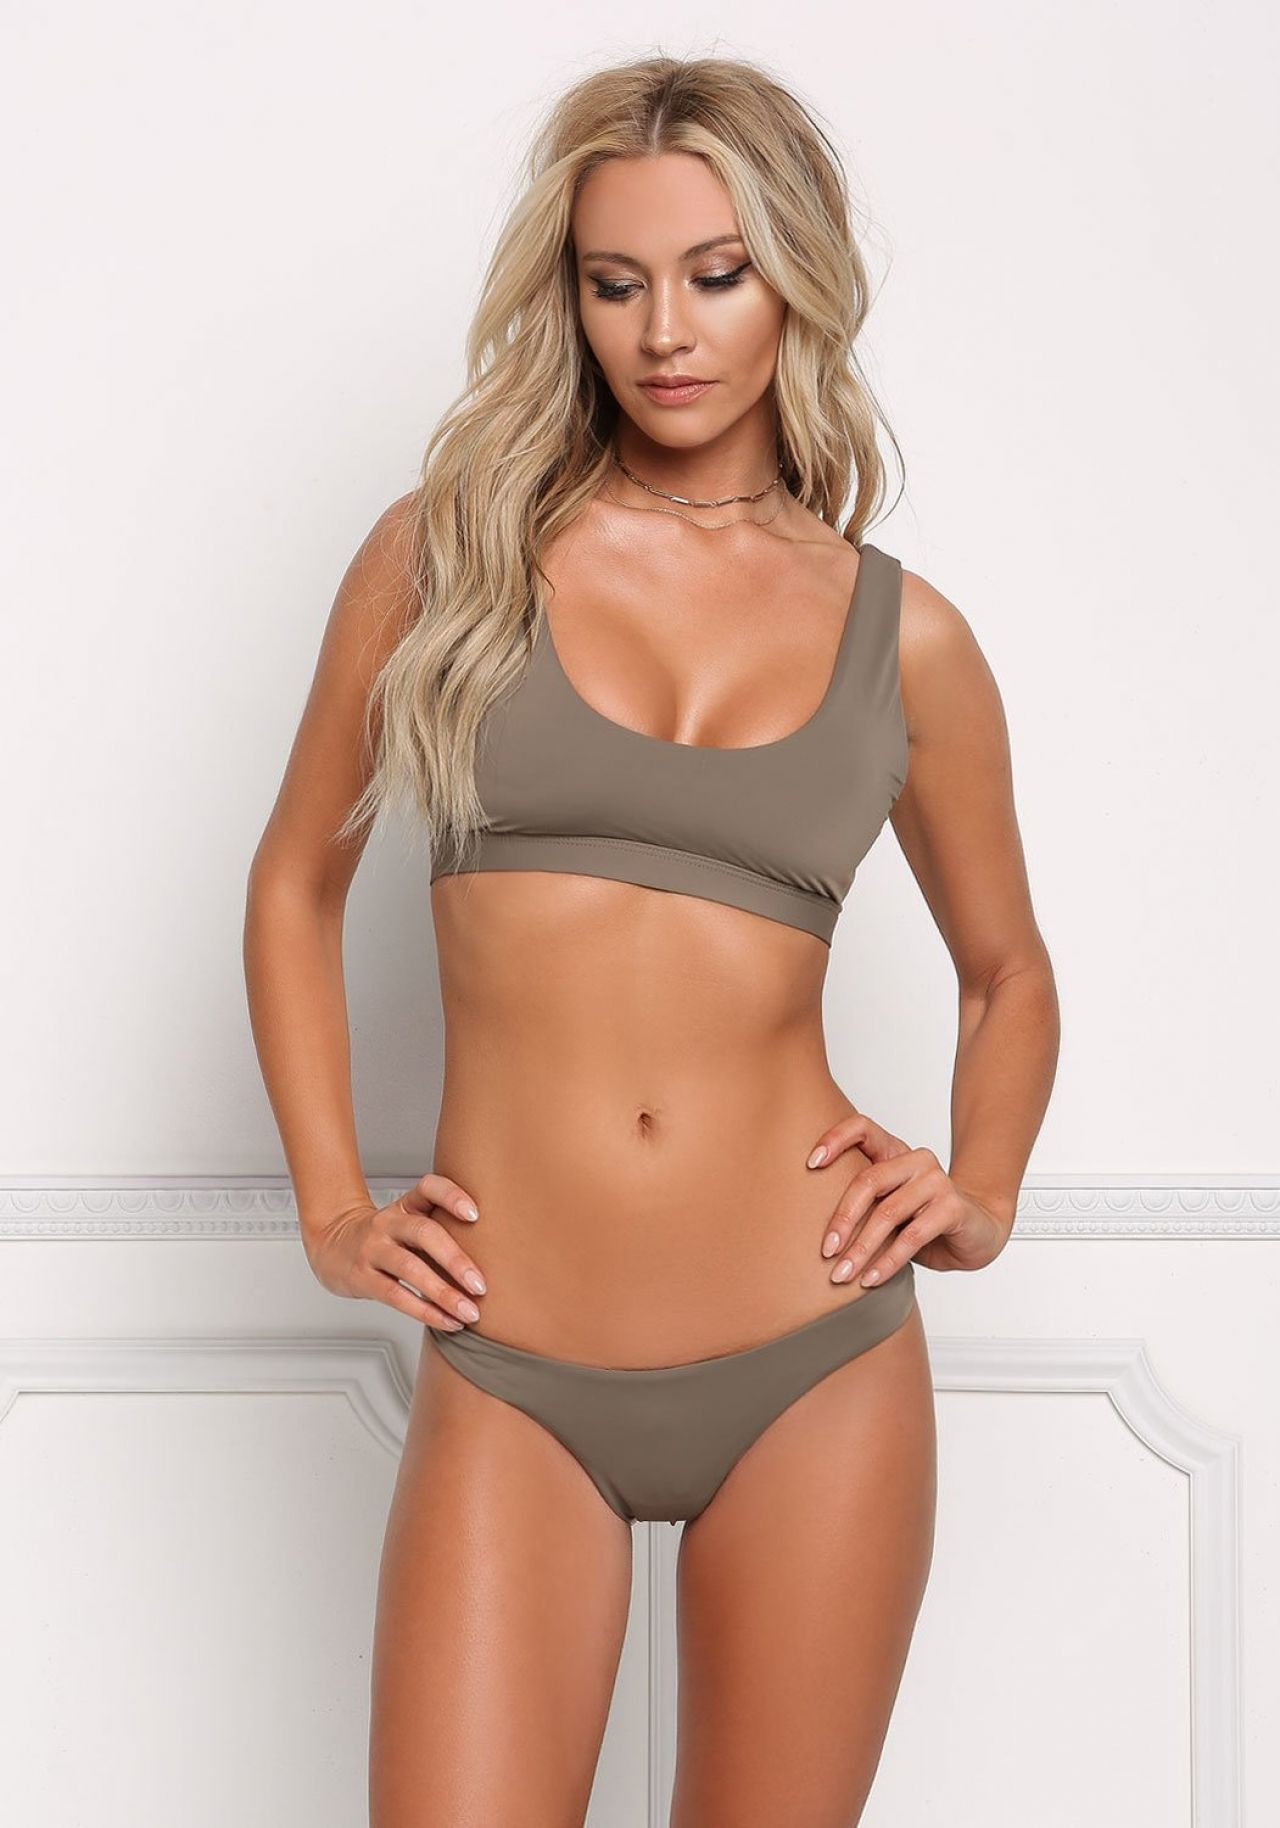 Cleavage Bryana Holly naked (37 photo), Tits, Cleavage, Selfie, legs 2019